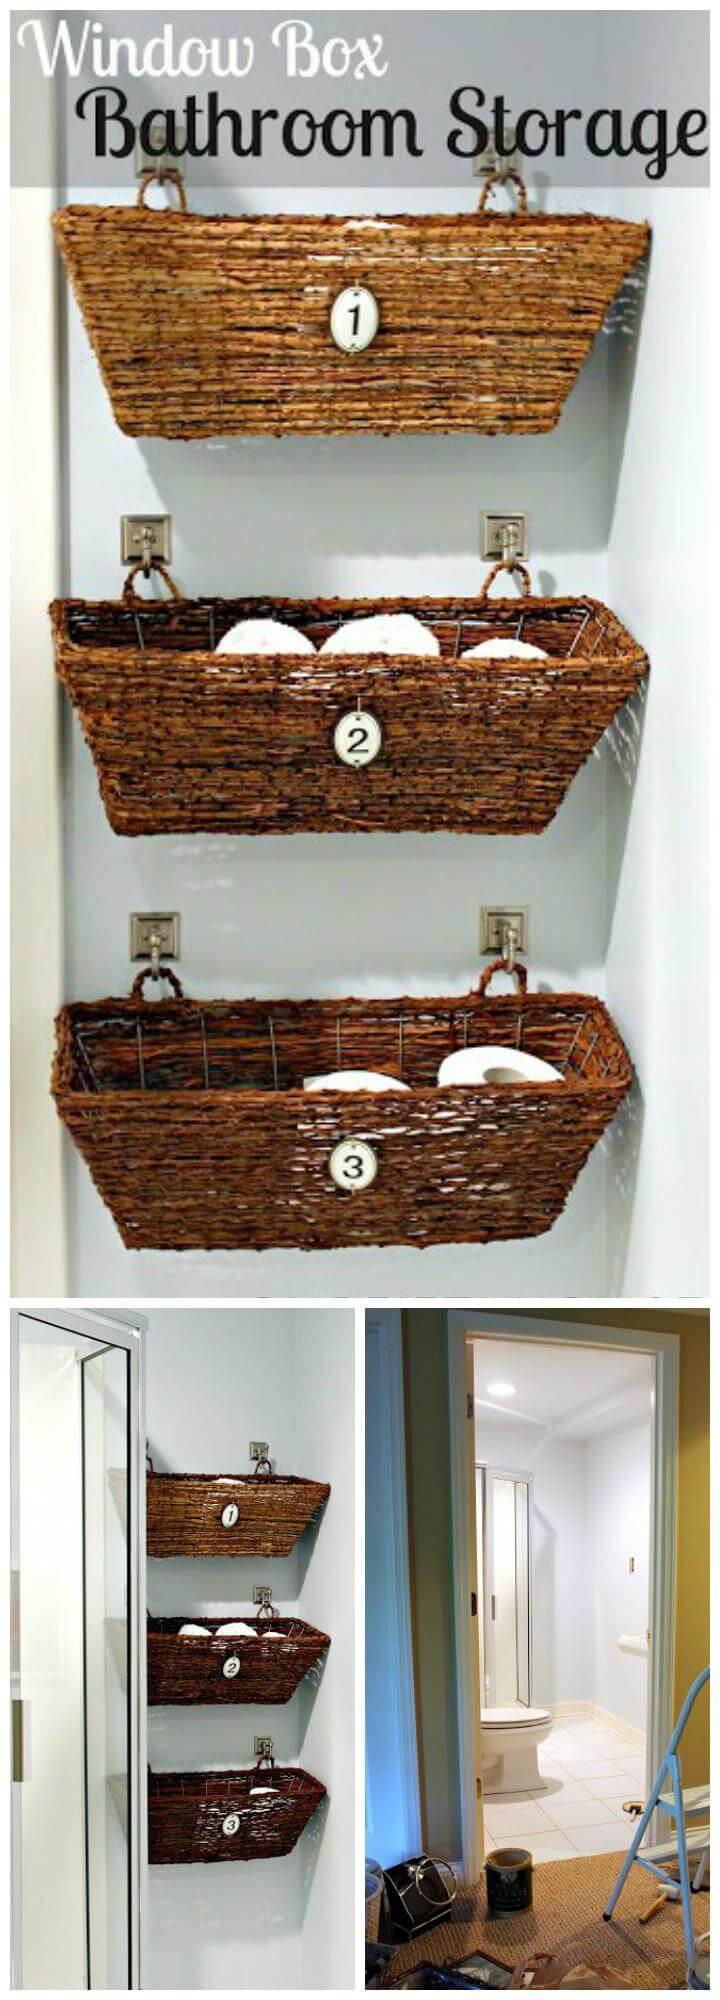 self-made and installed window box bathroom shelves